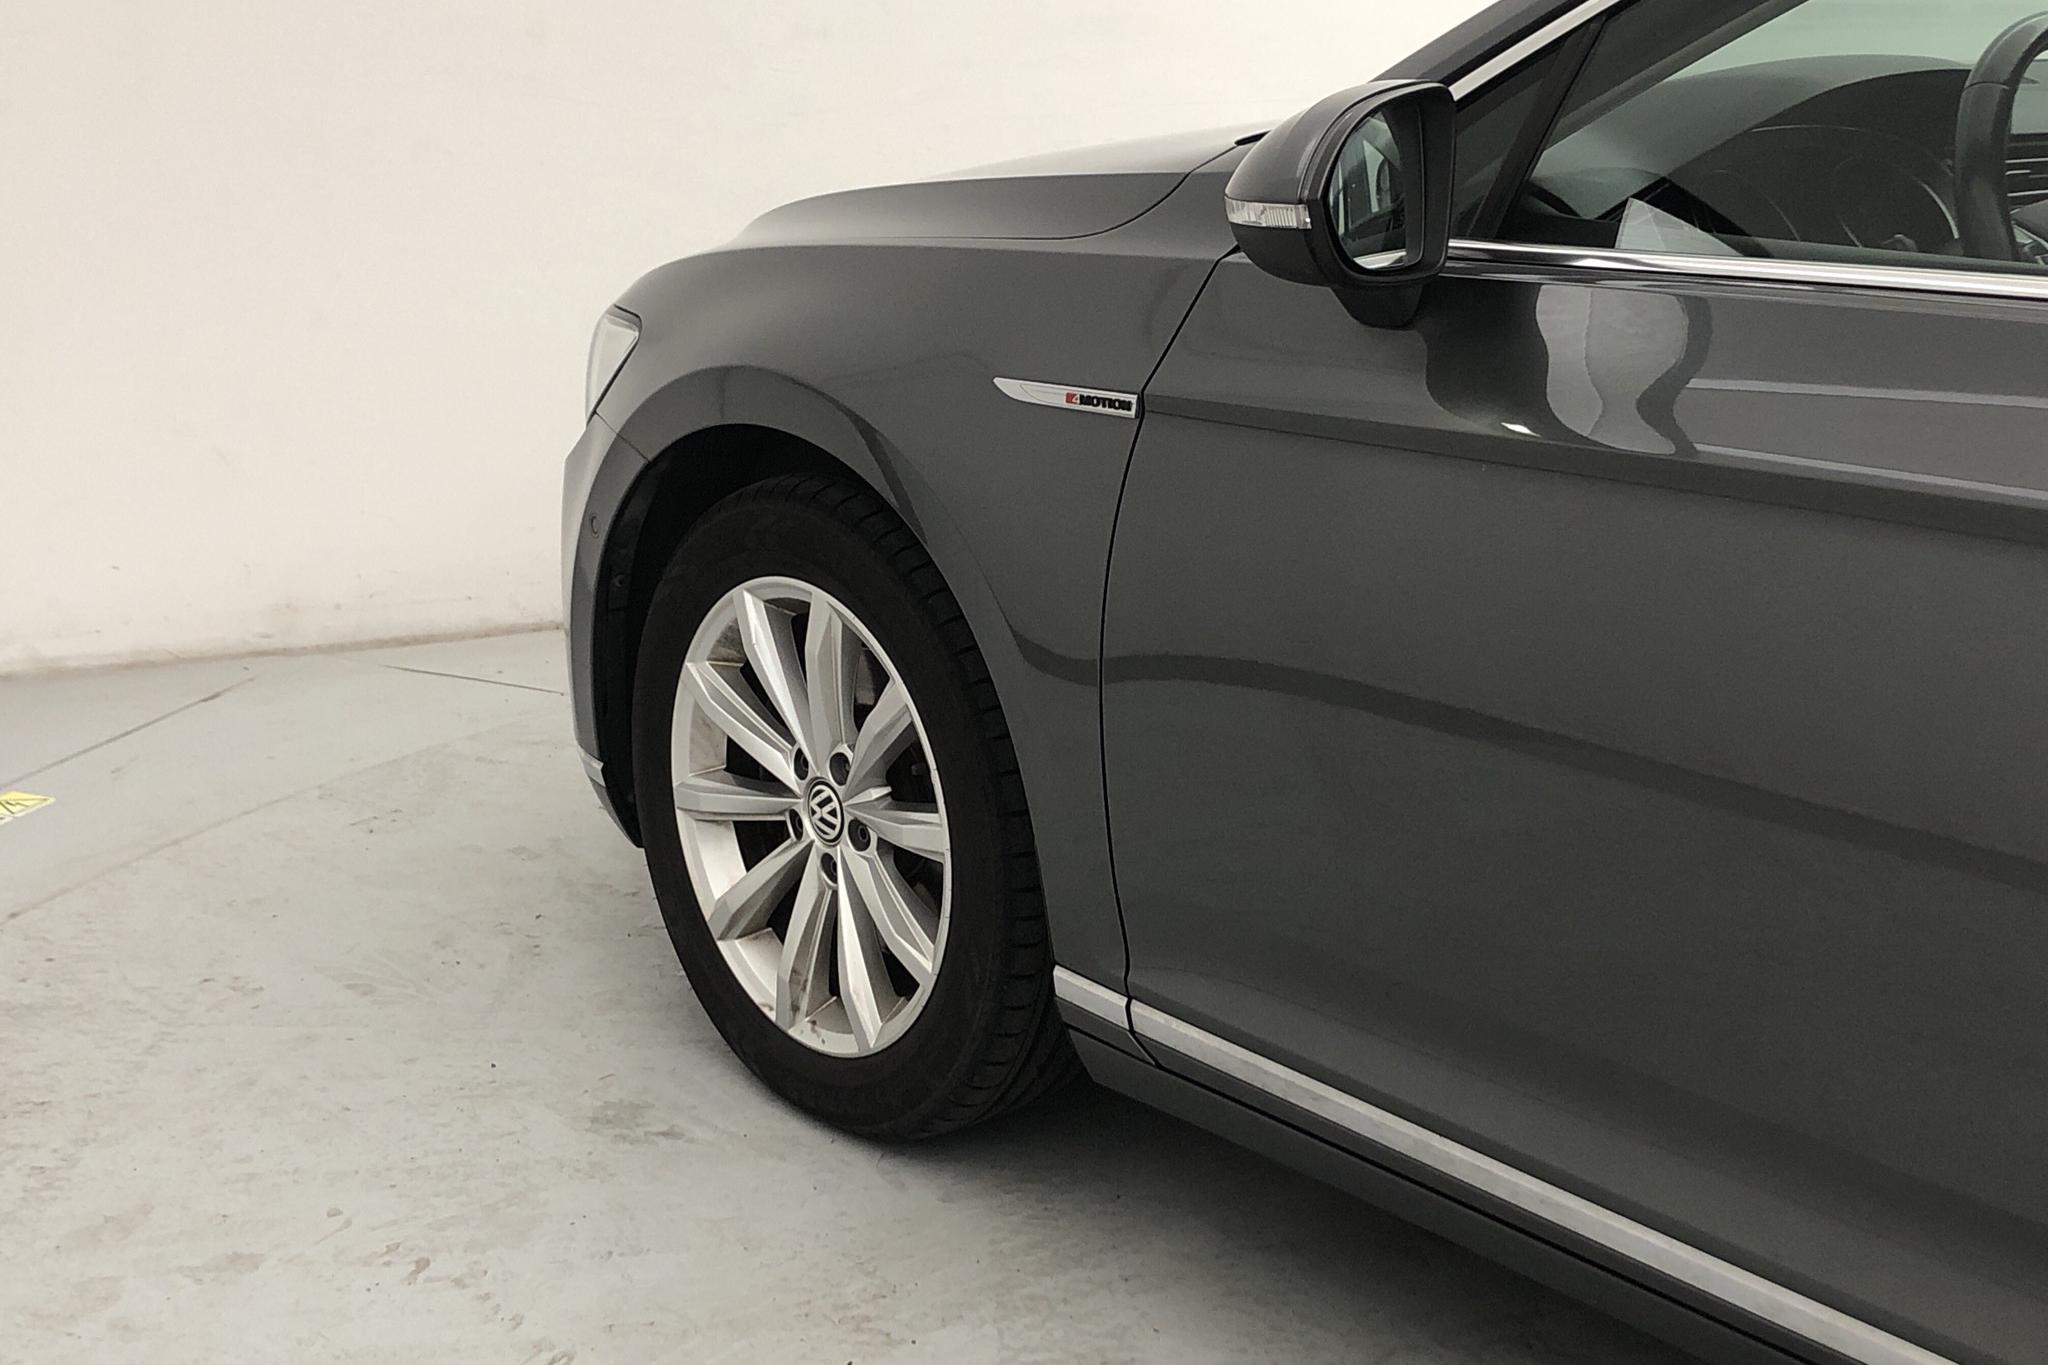 VW Passat 2.0 TDI Sportscombi 4MOTION (190hk) - 9 790 mil - Automat - grå - 2015